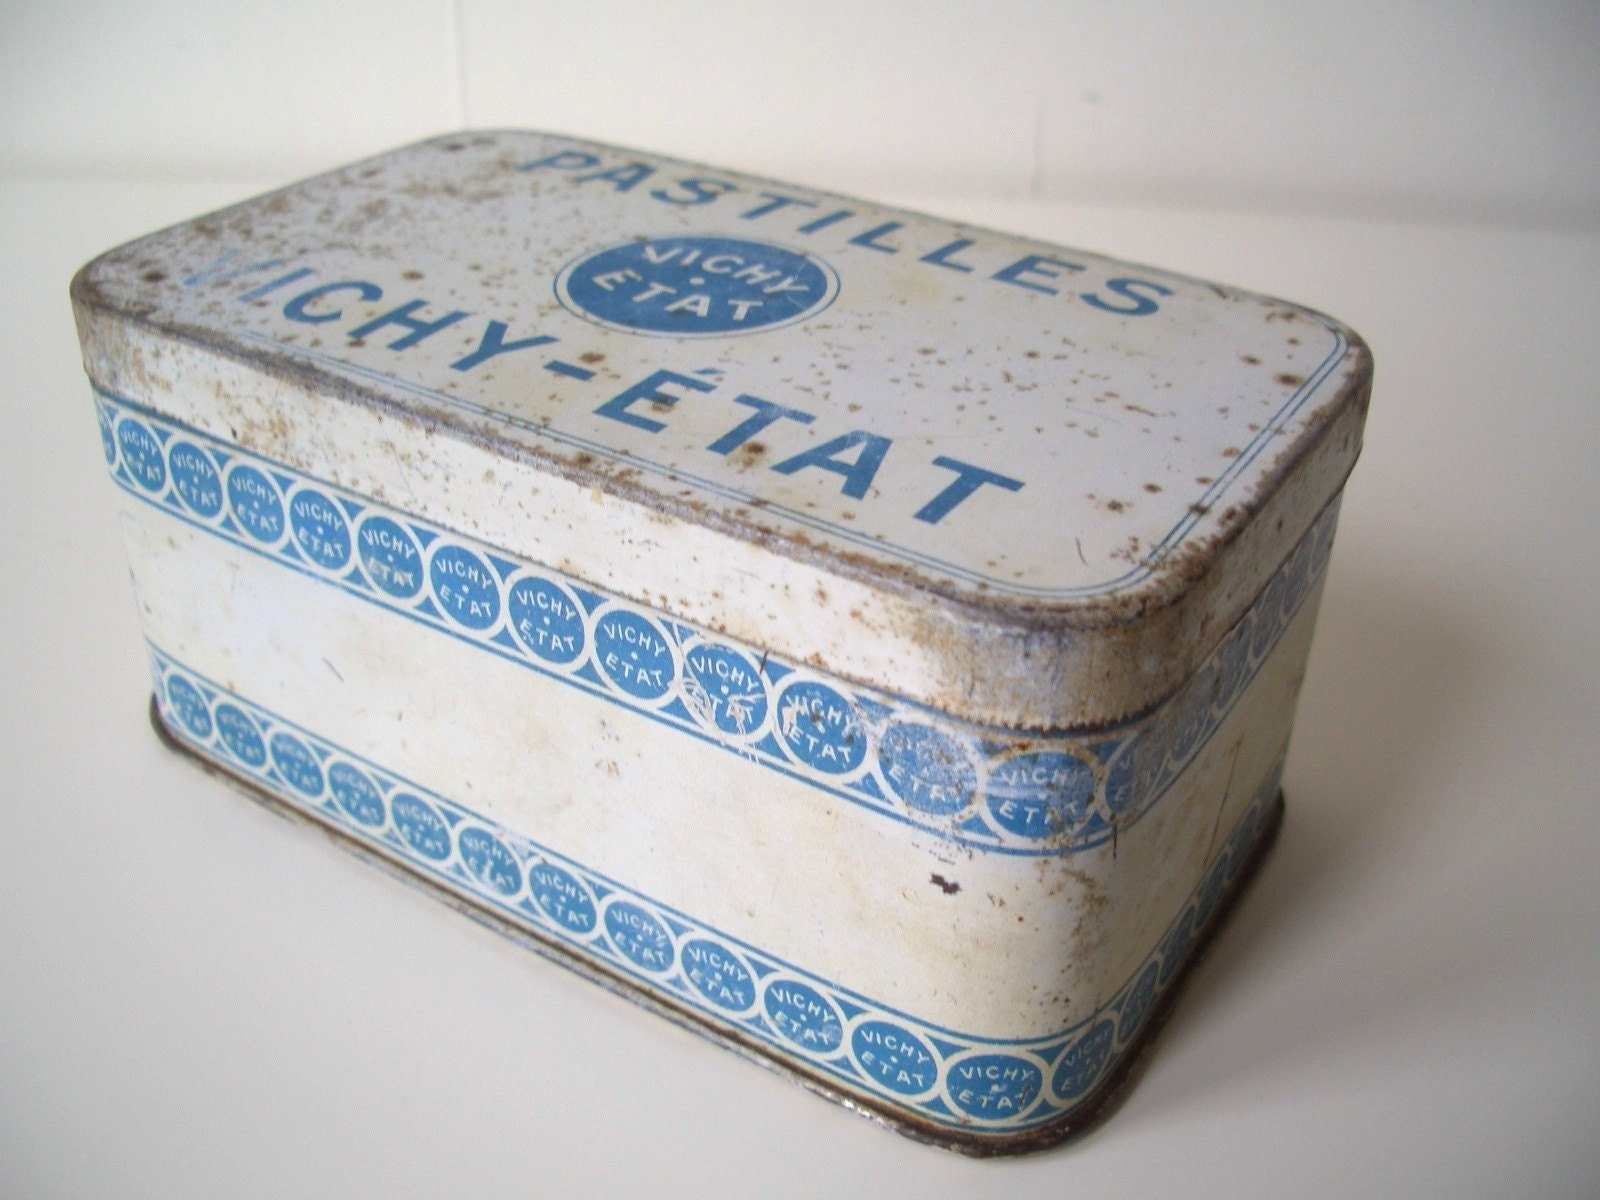 Vintage French Tin - Pastilles Vichy-Etat